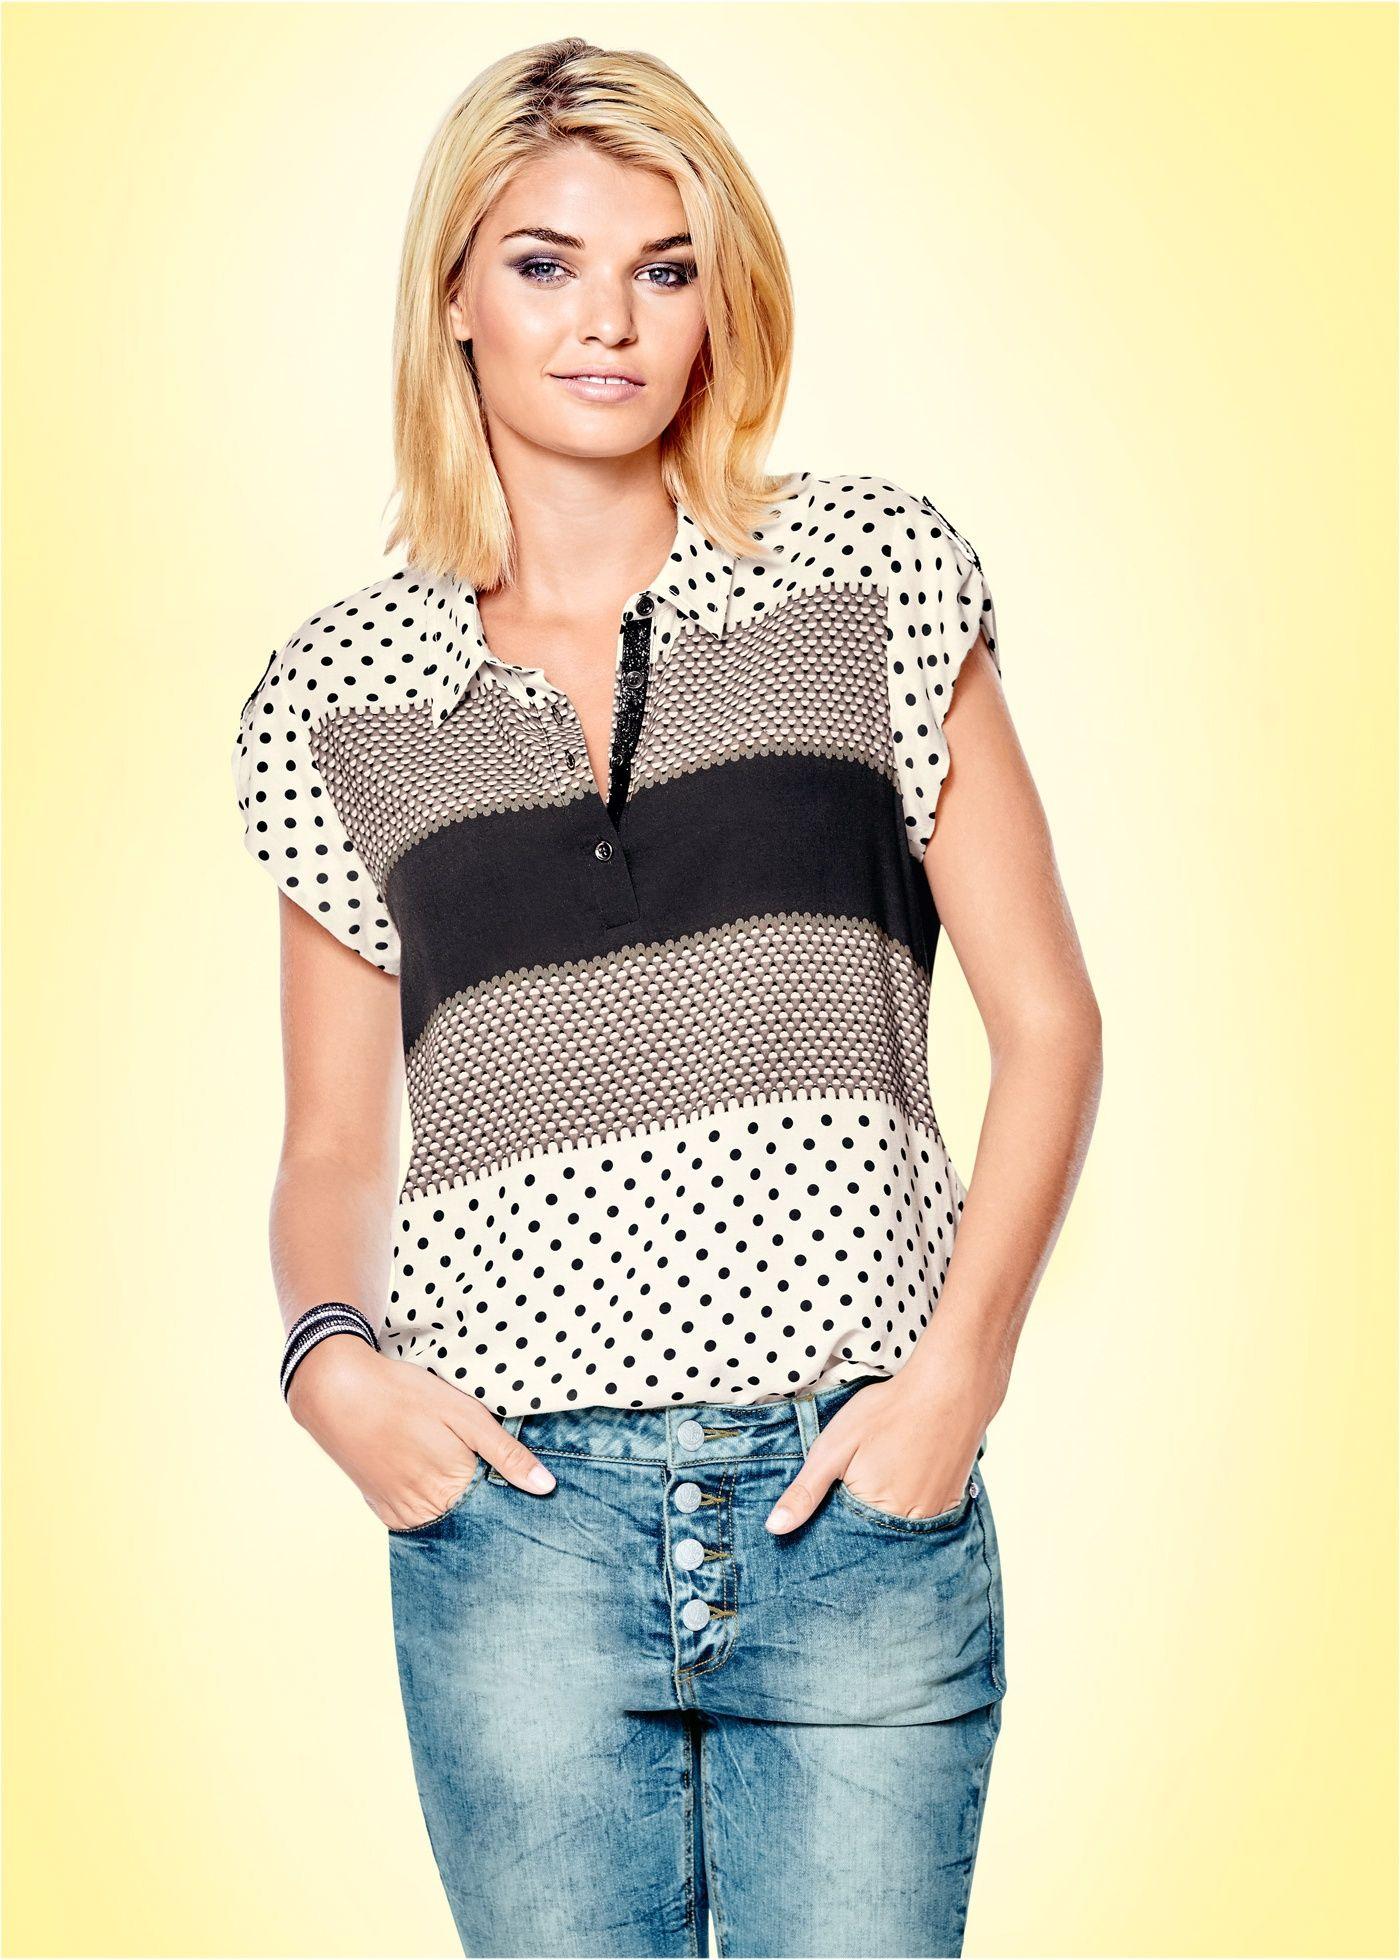 09b4d3305 Blusa branco/preto/marrom estampado encomendar agora na loja on-line ...